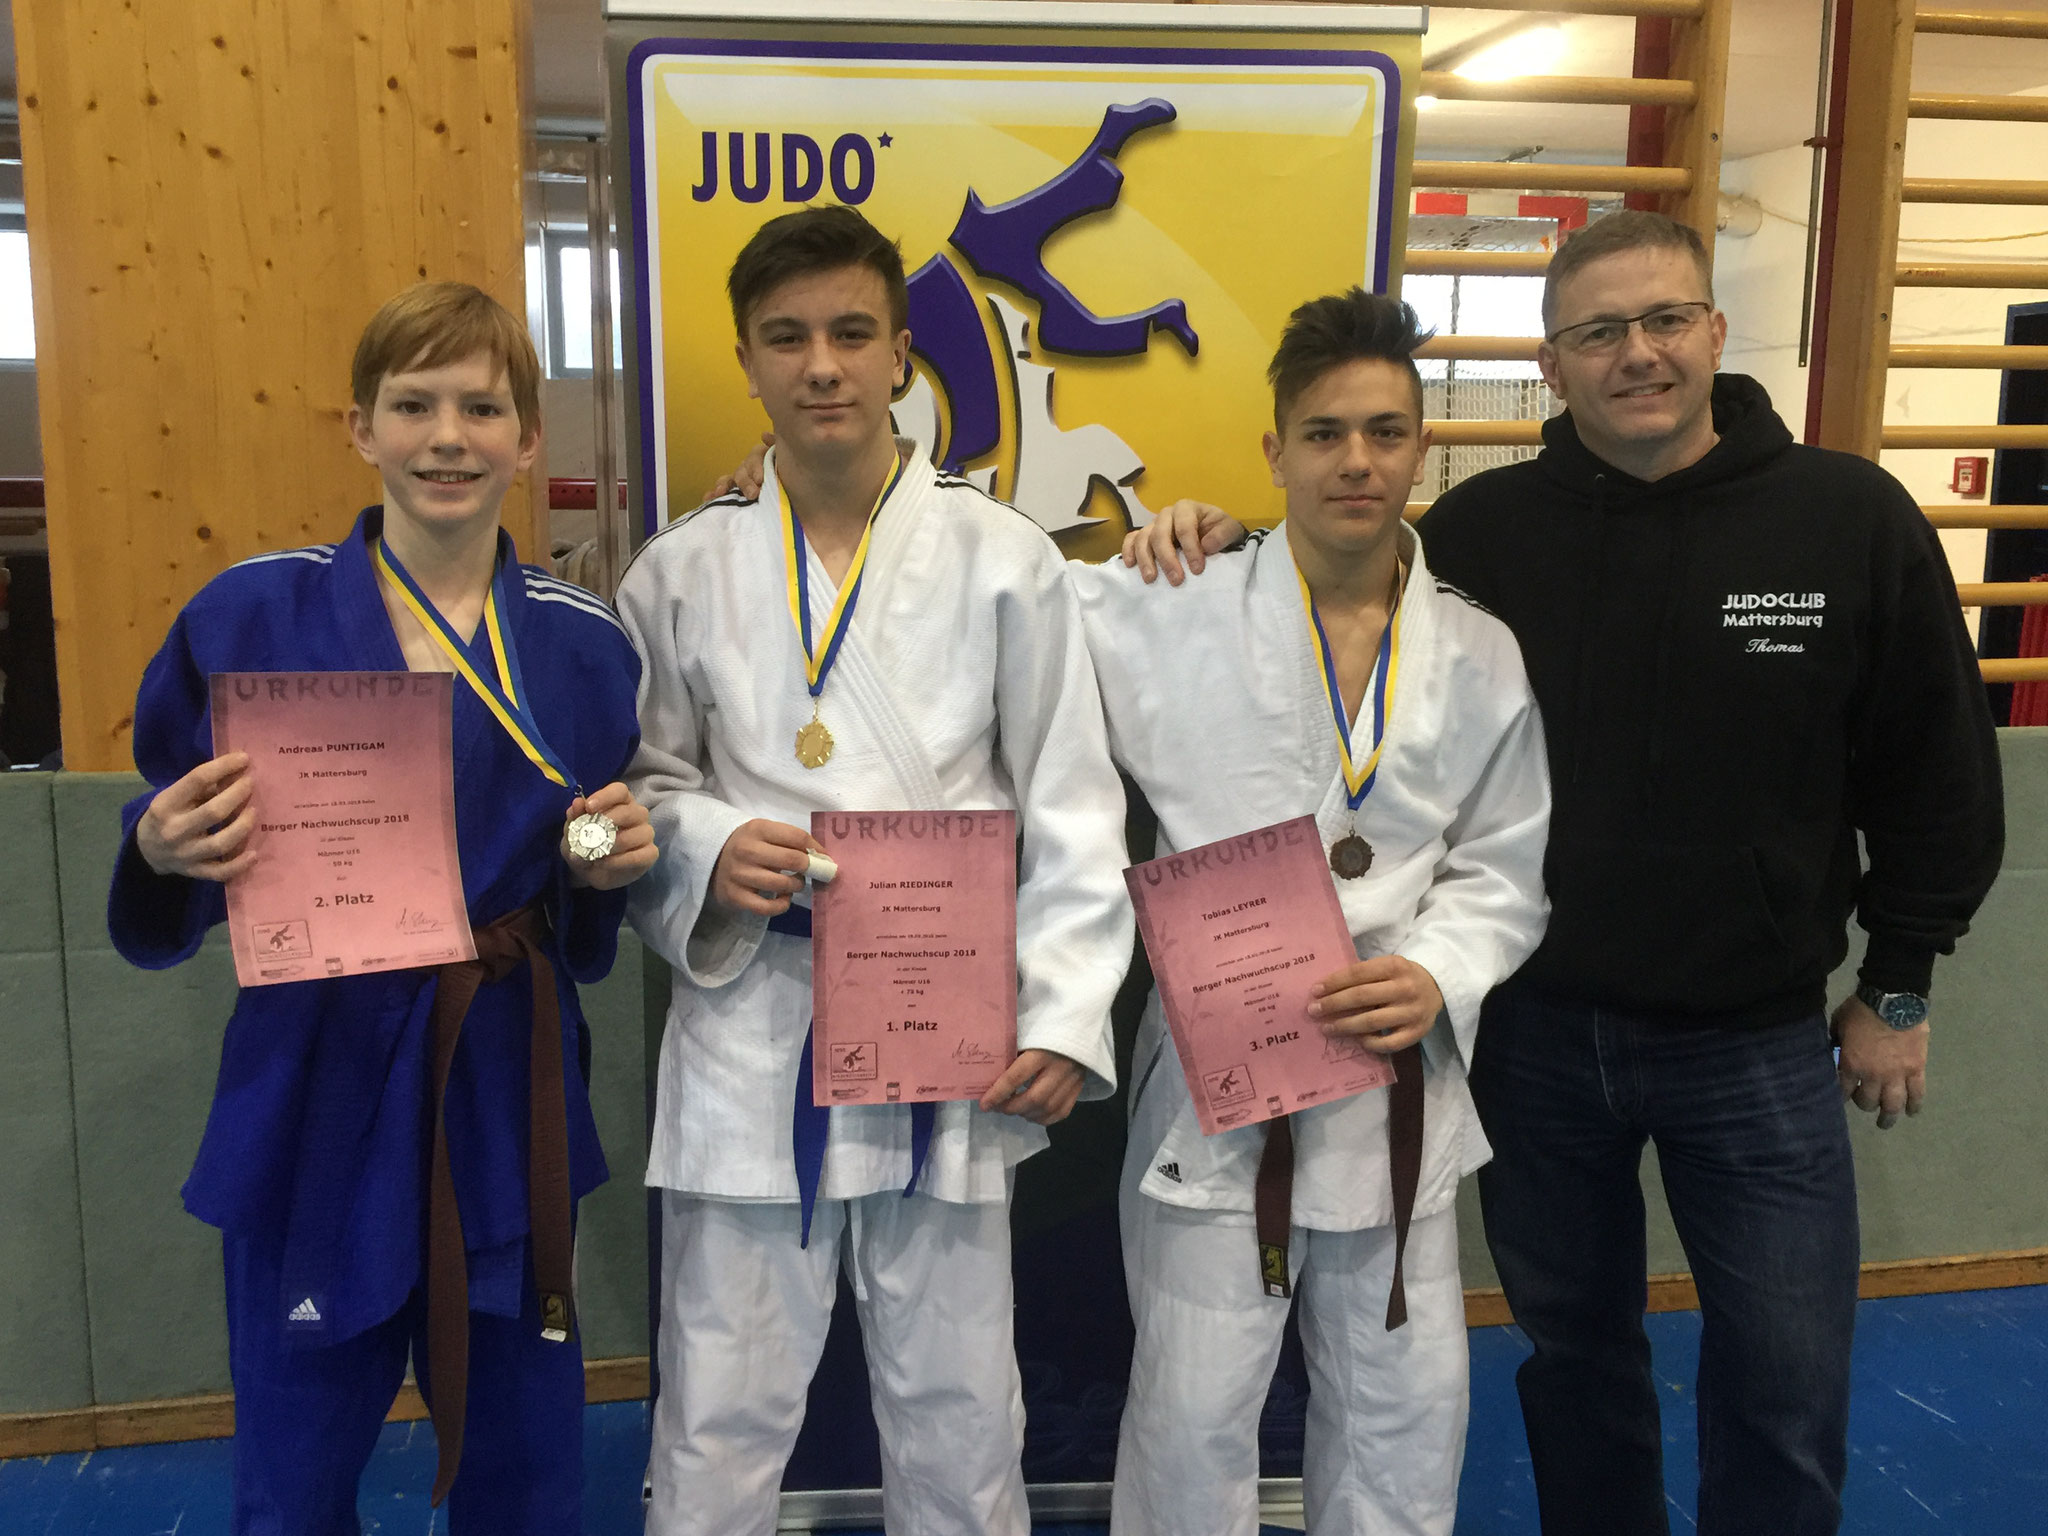 Andreas Puntigam, Julian Riedinger, Tobias Leyrer, Trainer T. Puntigam